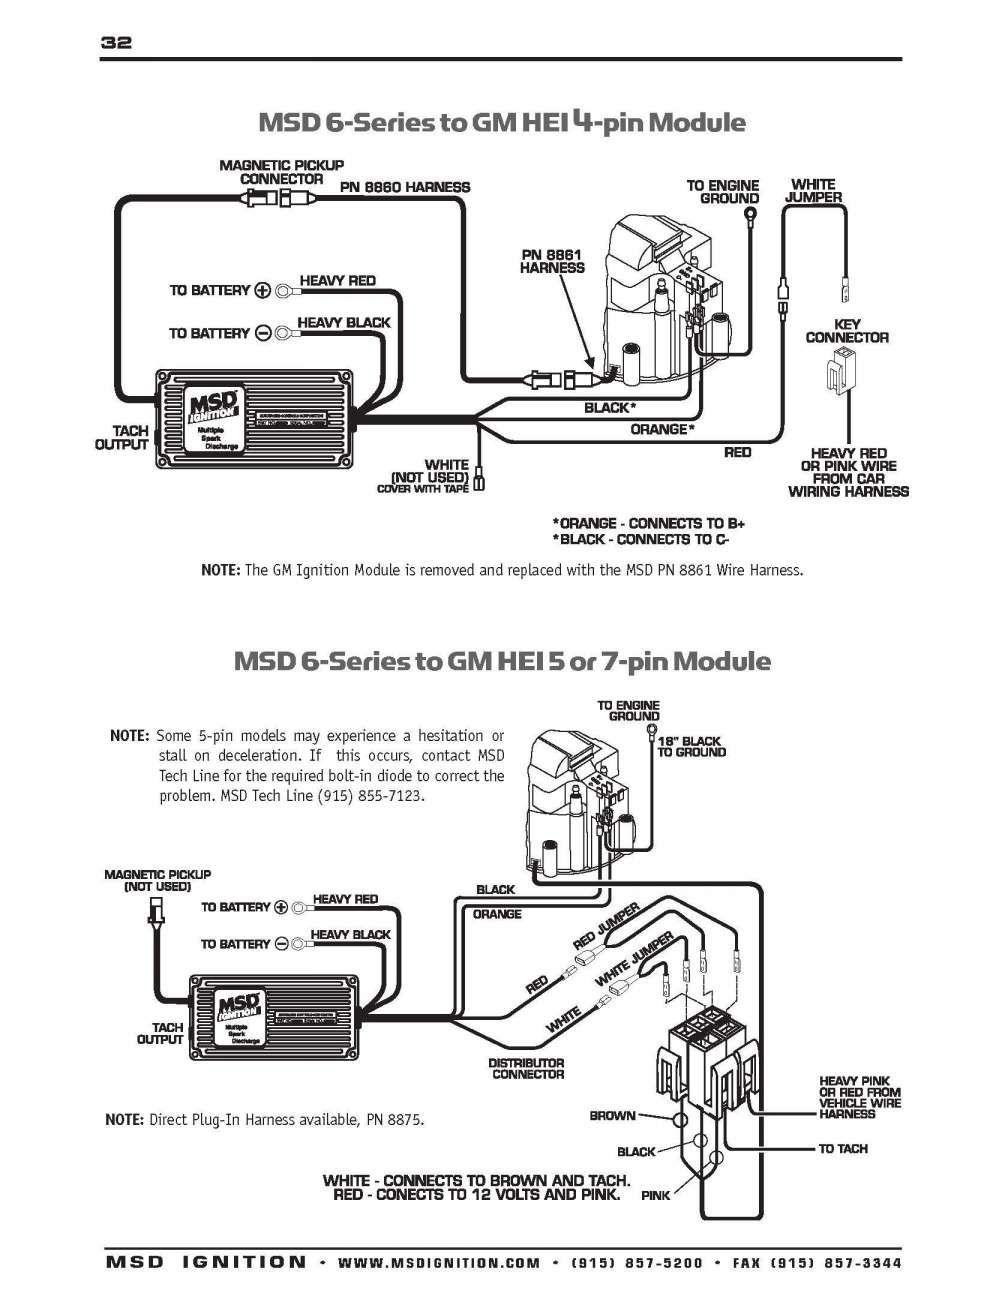 67 Chevelle Dash Wiring Diagram Free Download